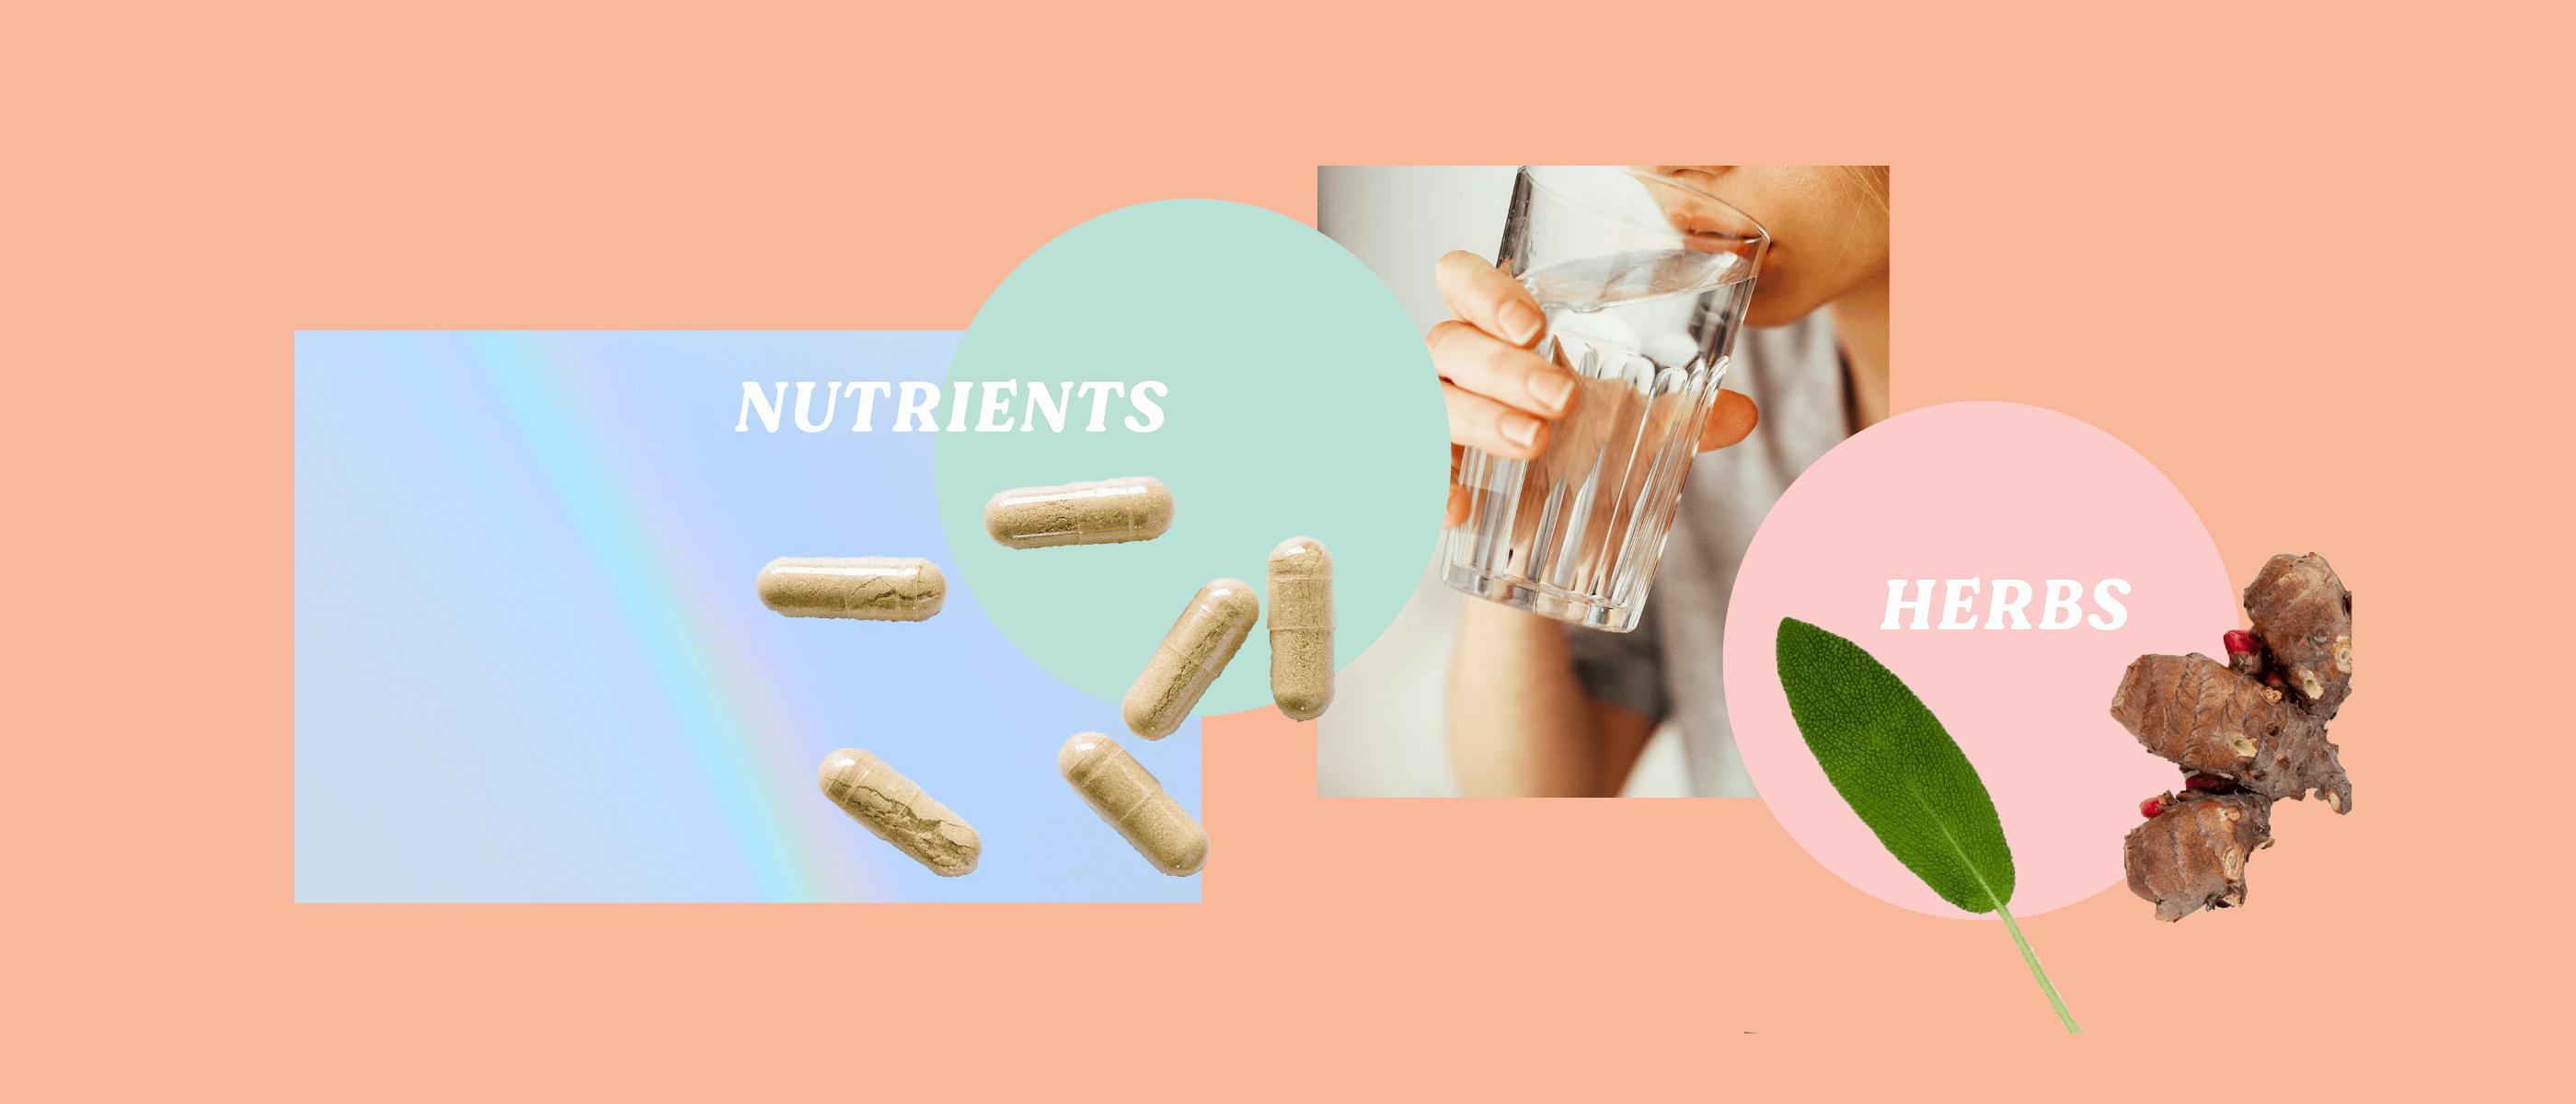 5 Herbs & Nutrients For Balanced Hormones